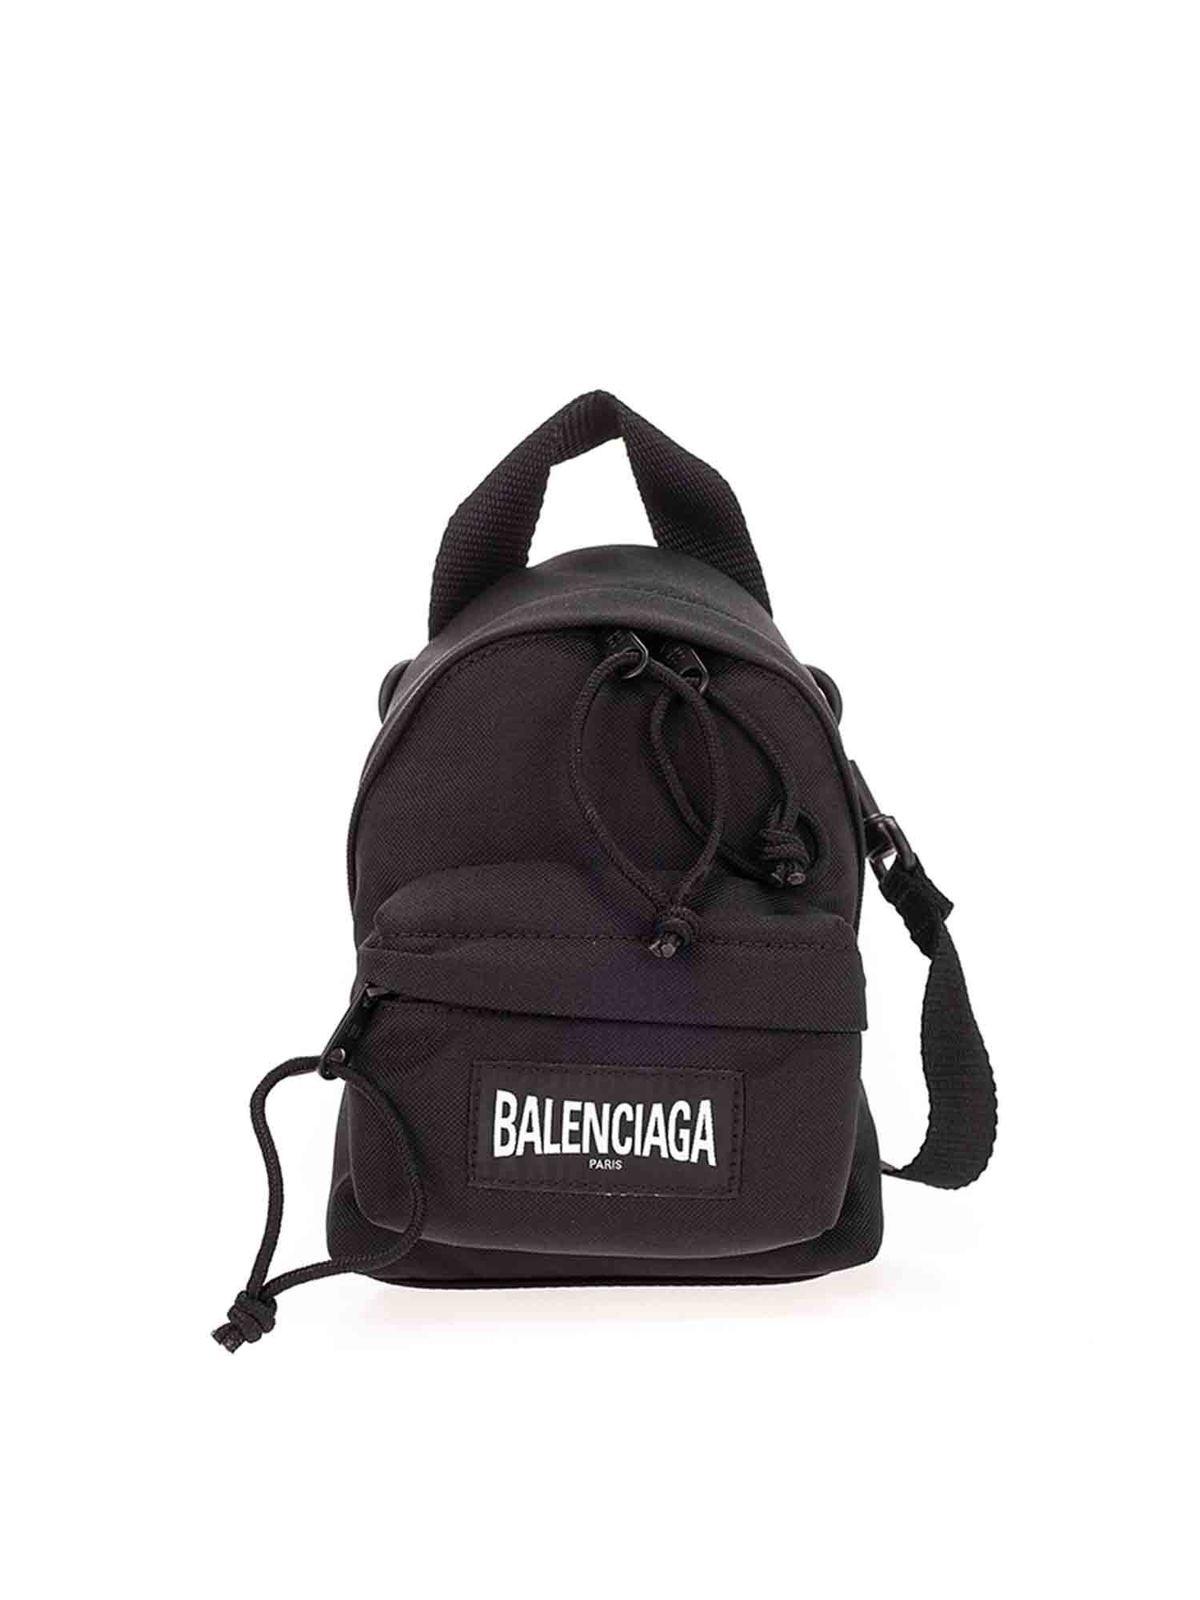 Balenciaga OVERSIZE MINI BACKPACK IN BLACK